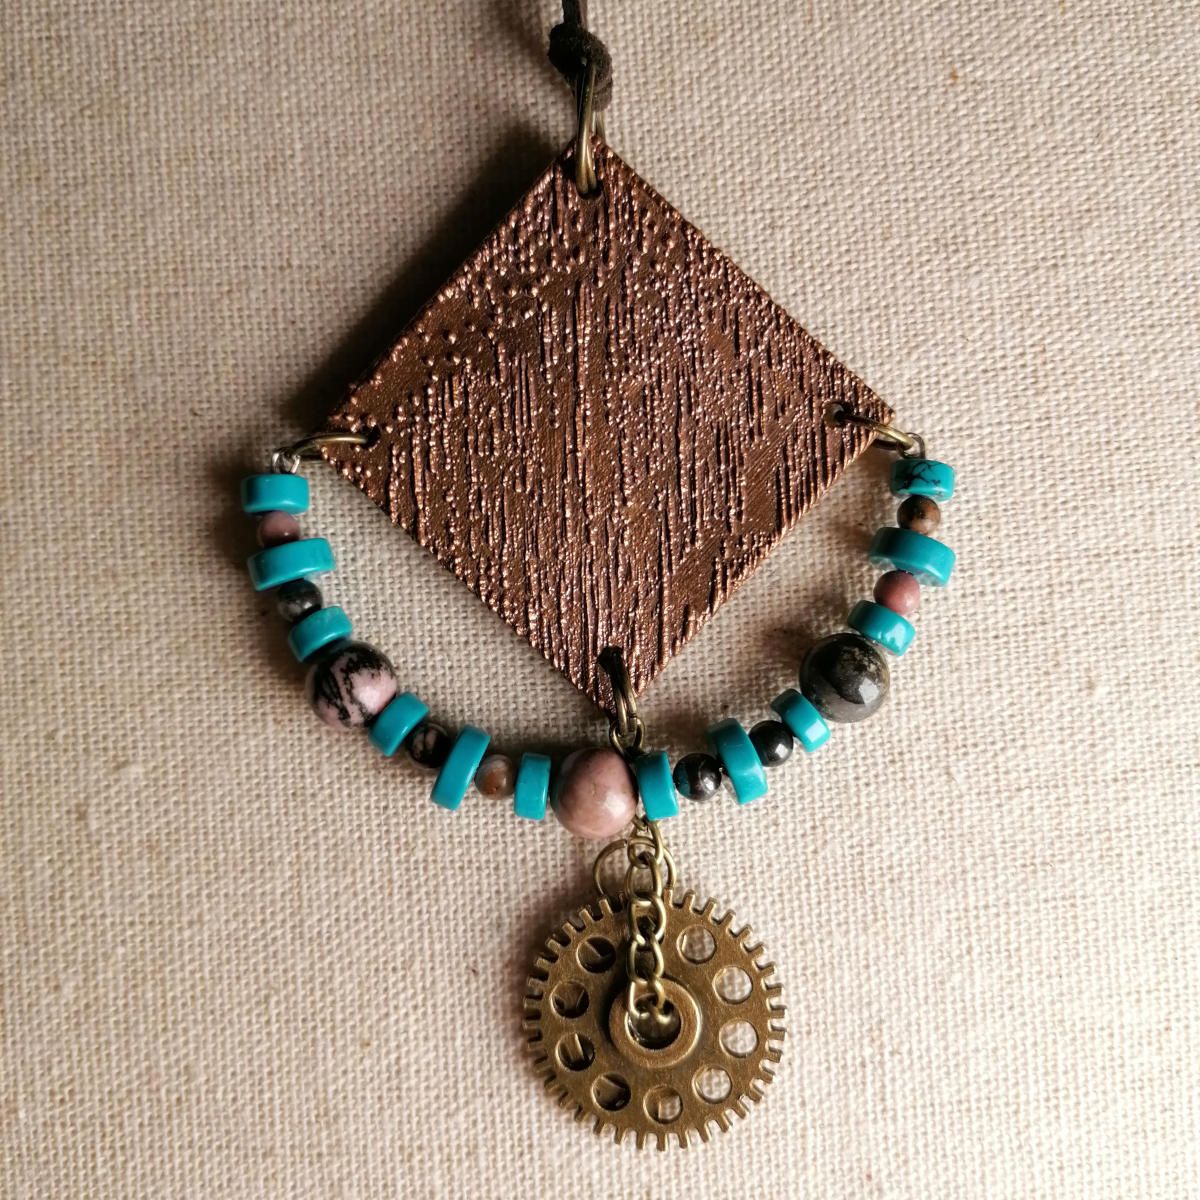 Steampunk pendant - handmade in Austria